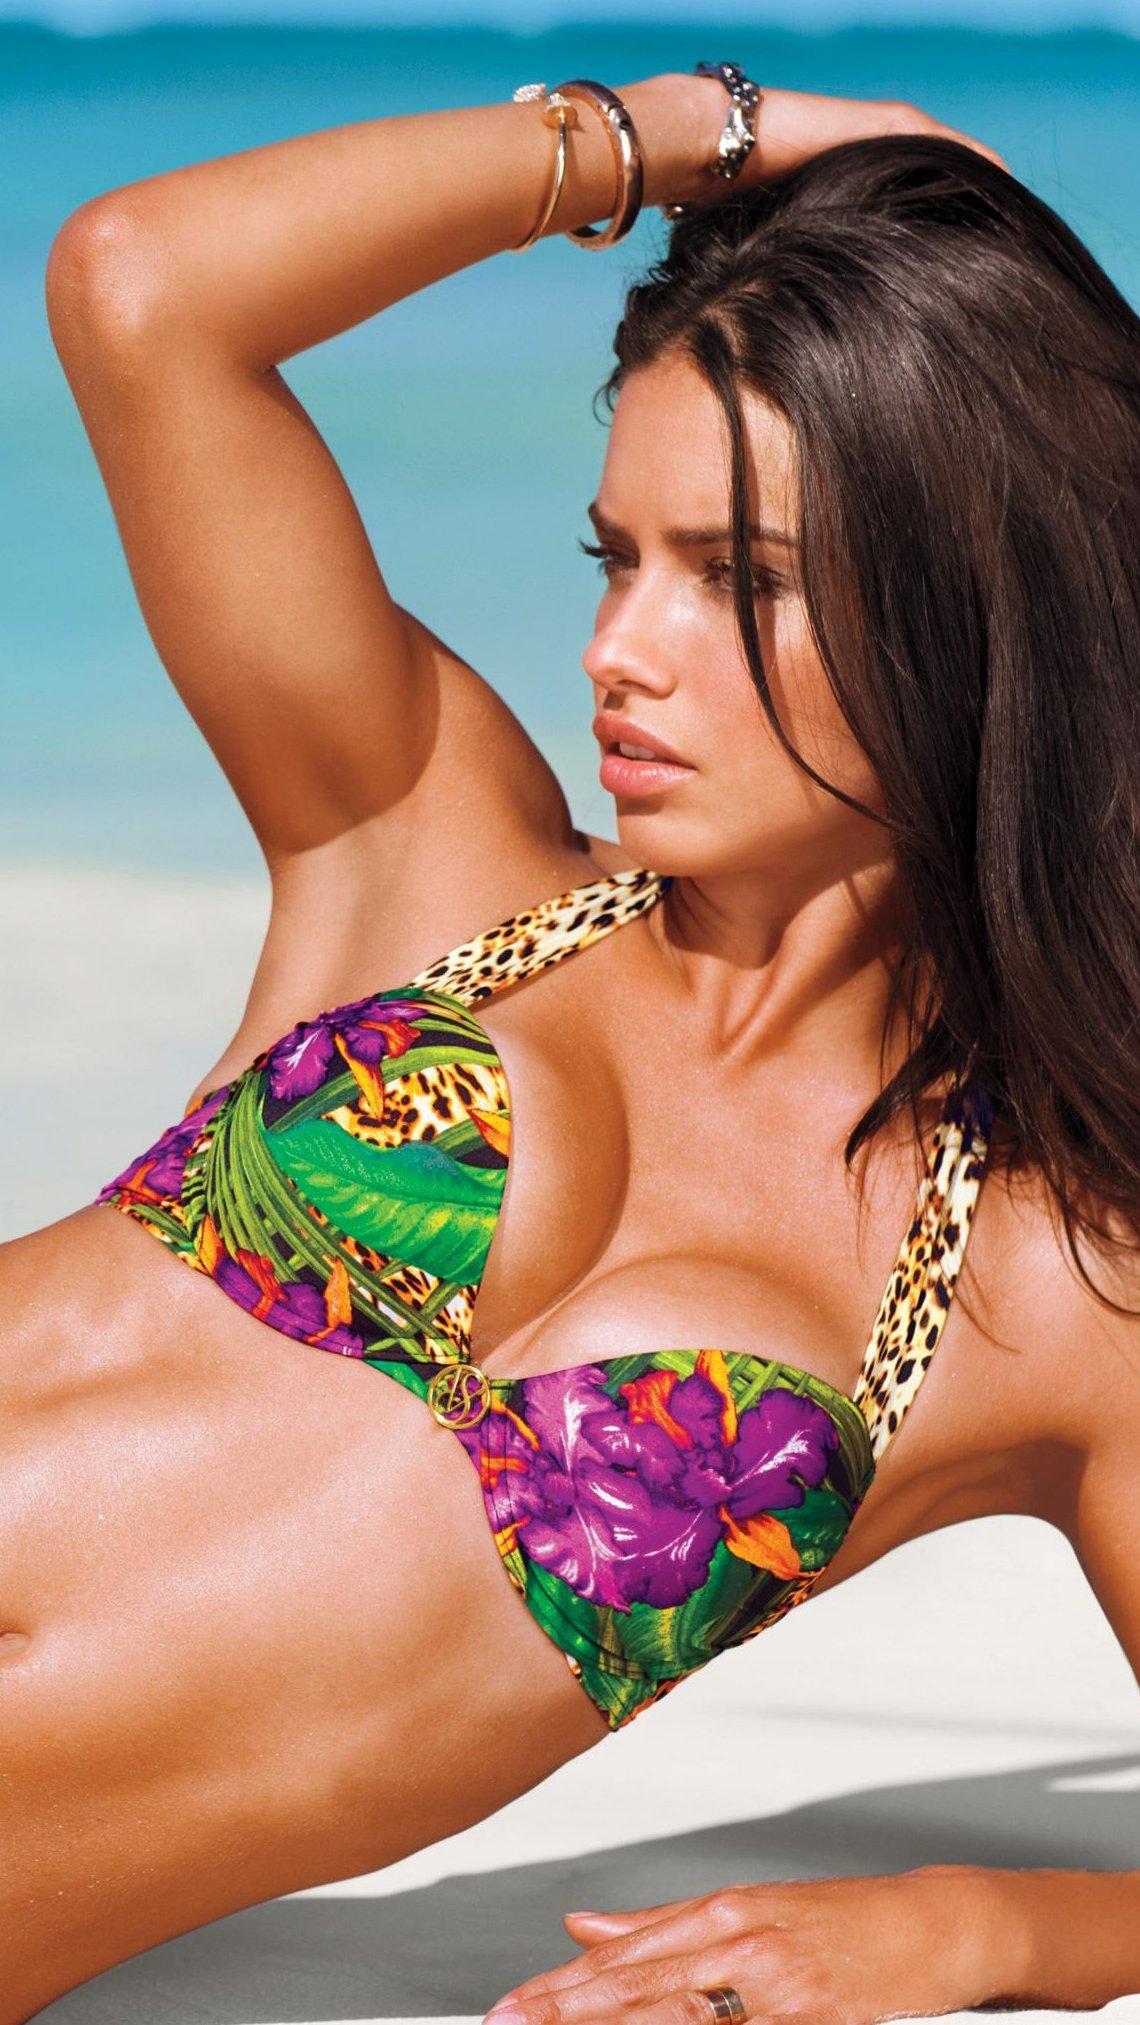 Wallpaper Adriana Lima Bikini Vertical